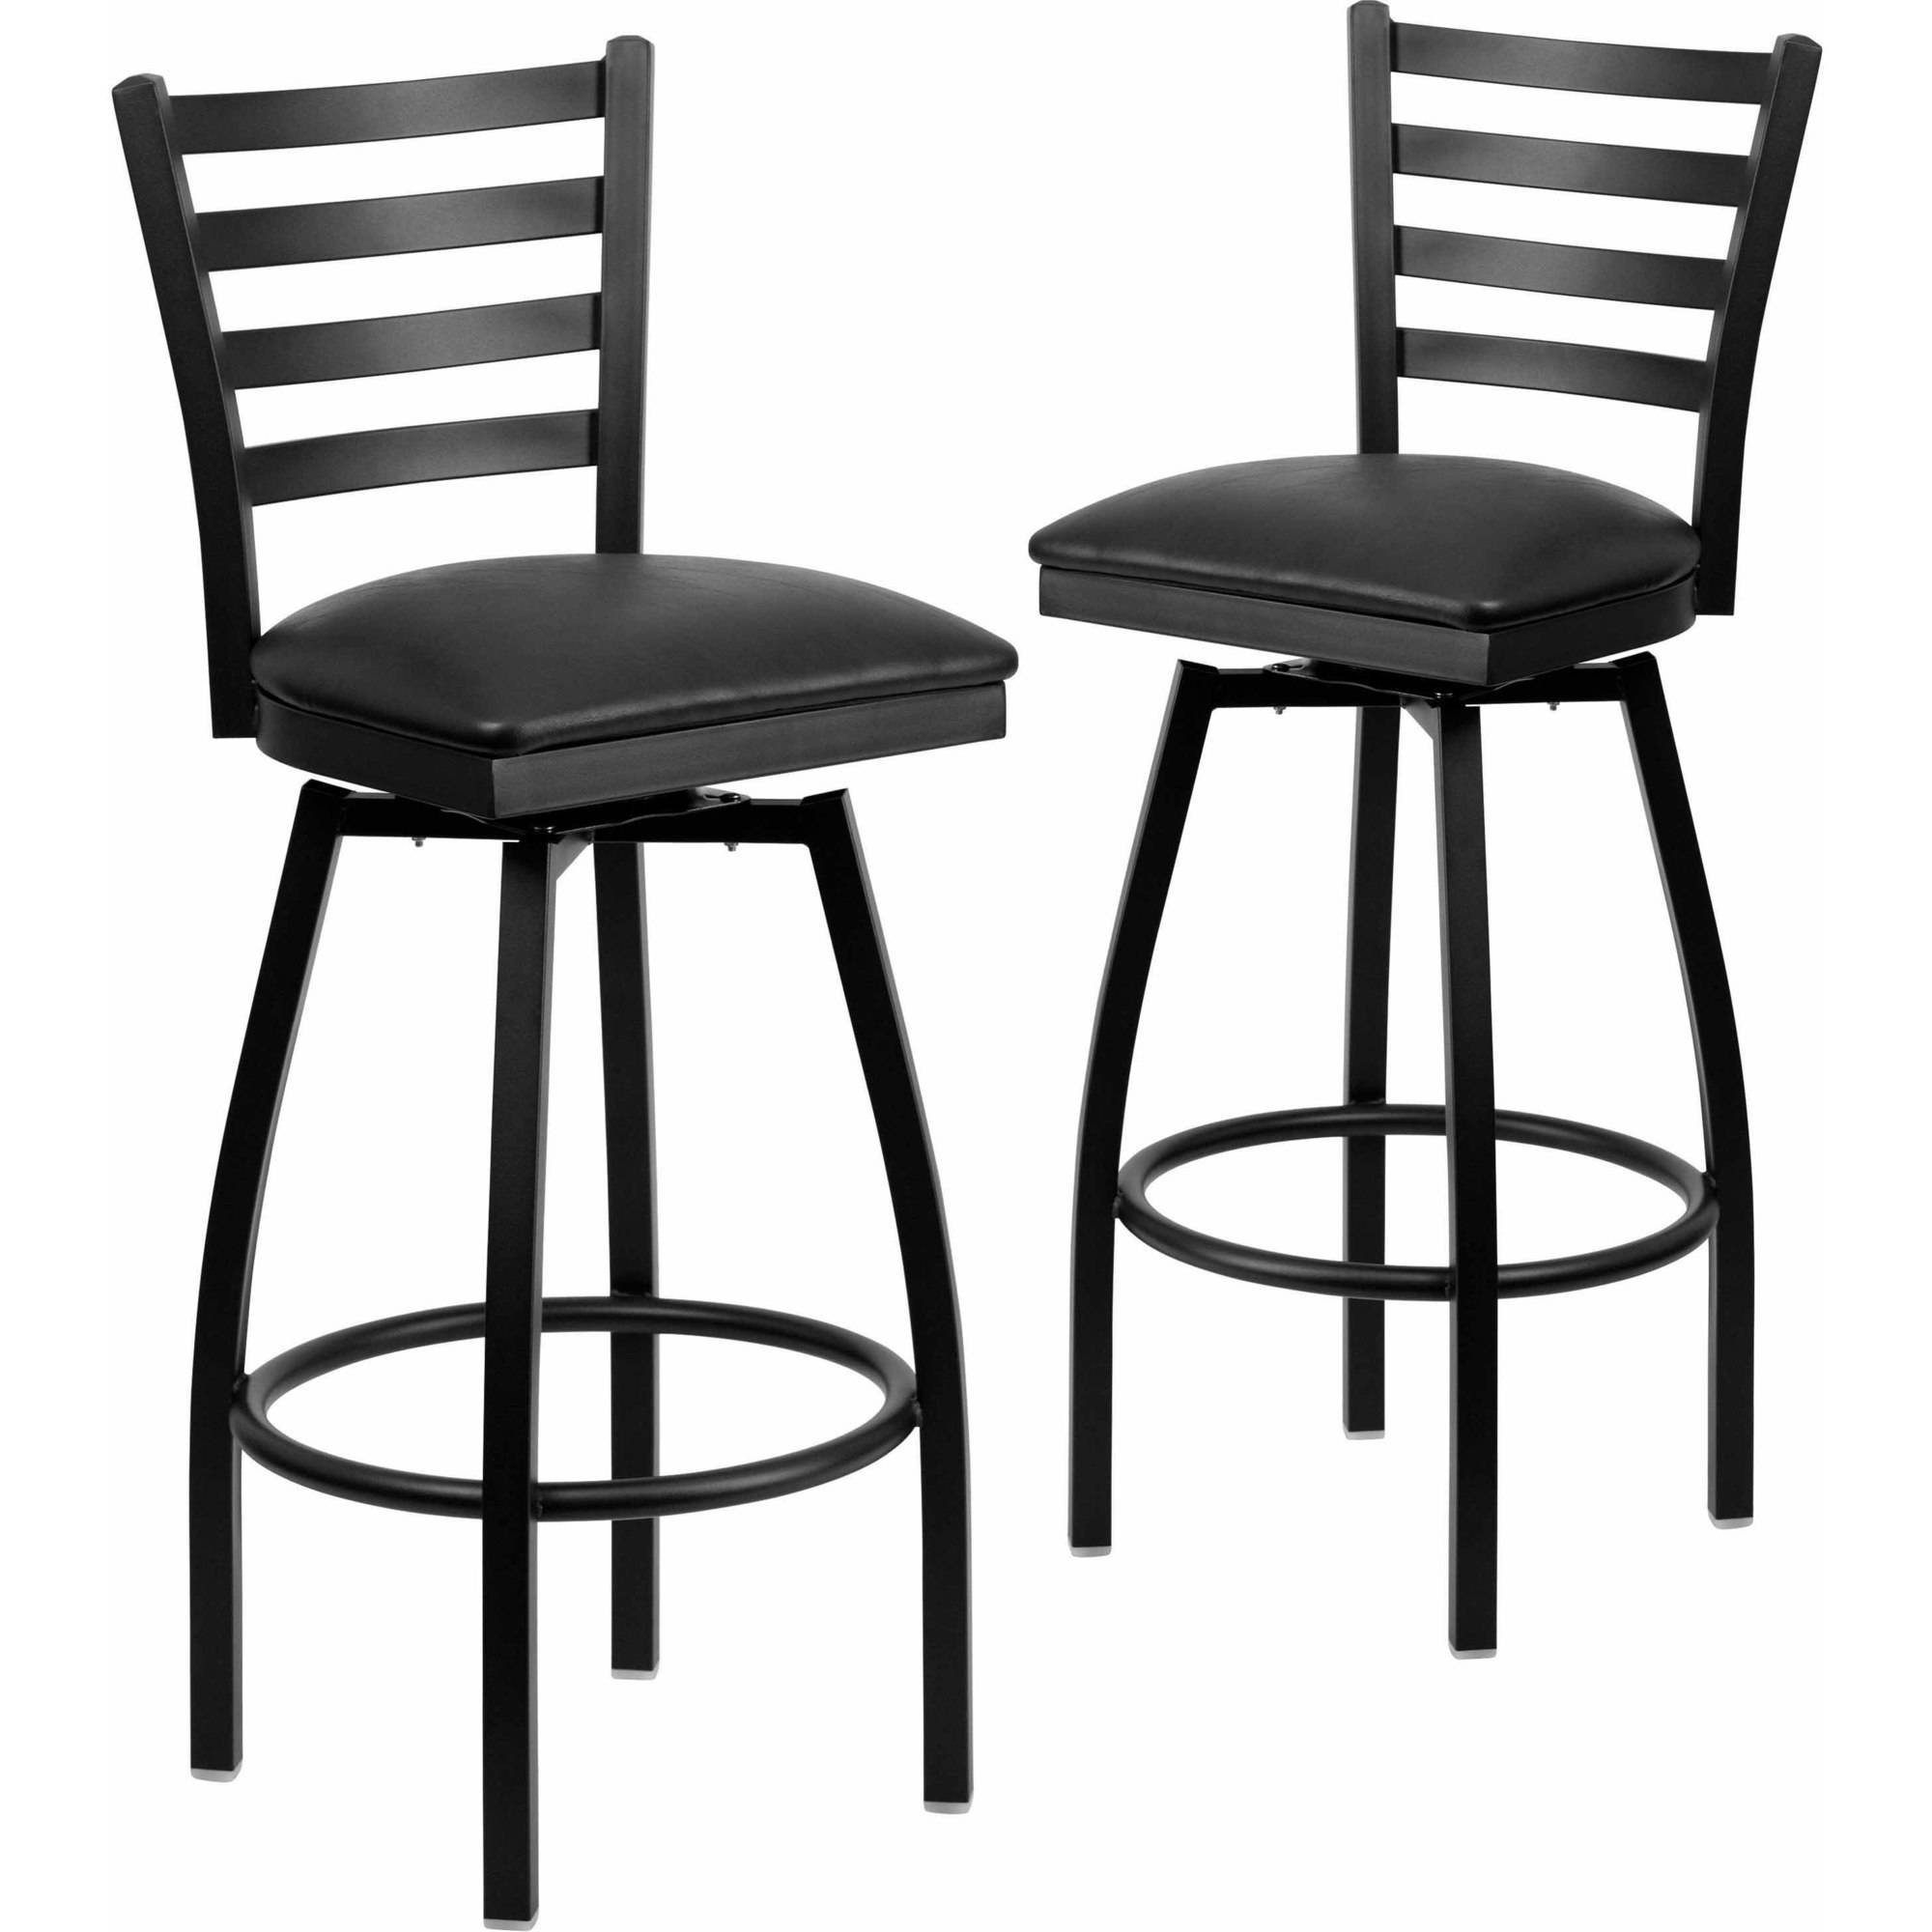 Flash Furniture 2-Pack HERCULES Series Black Ladder Back Swivel Metal Barstool, Vinyl Seat, Multiple Colors